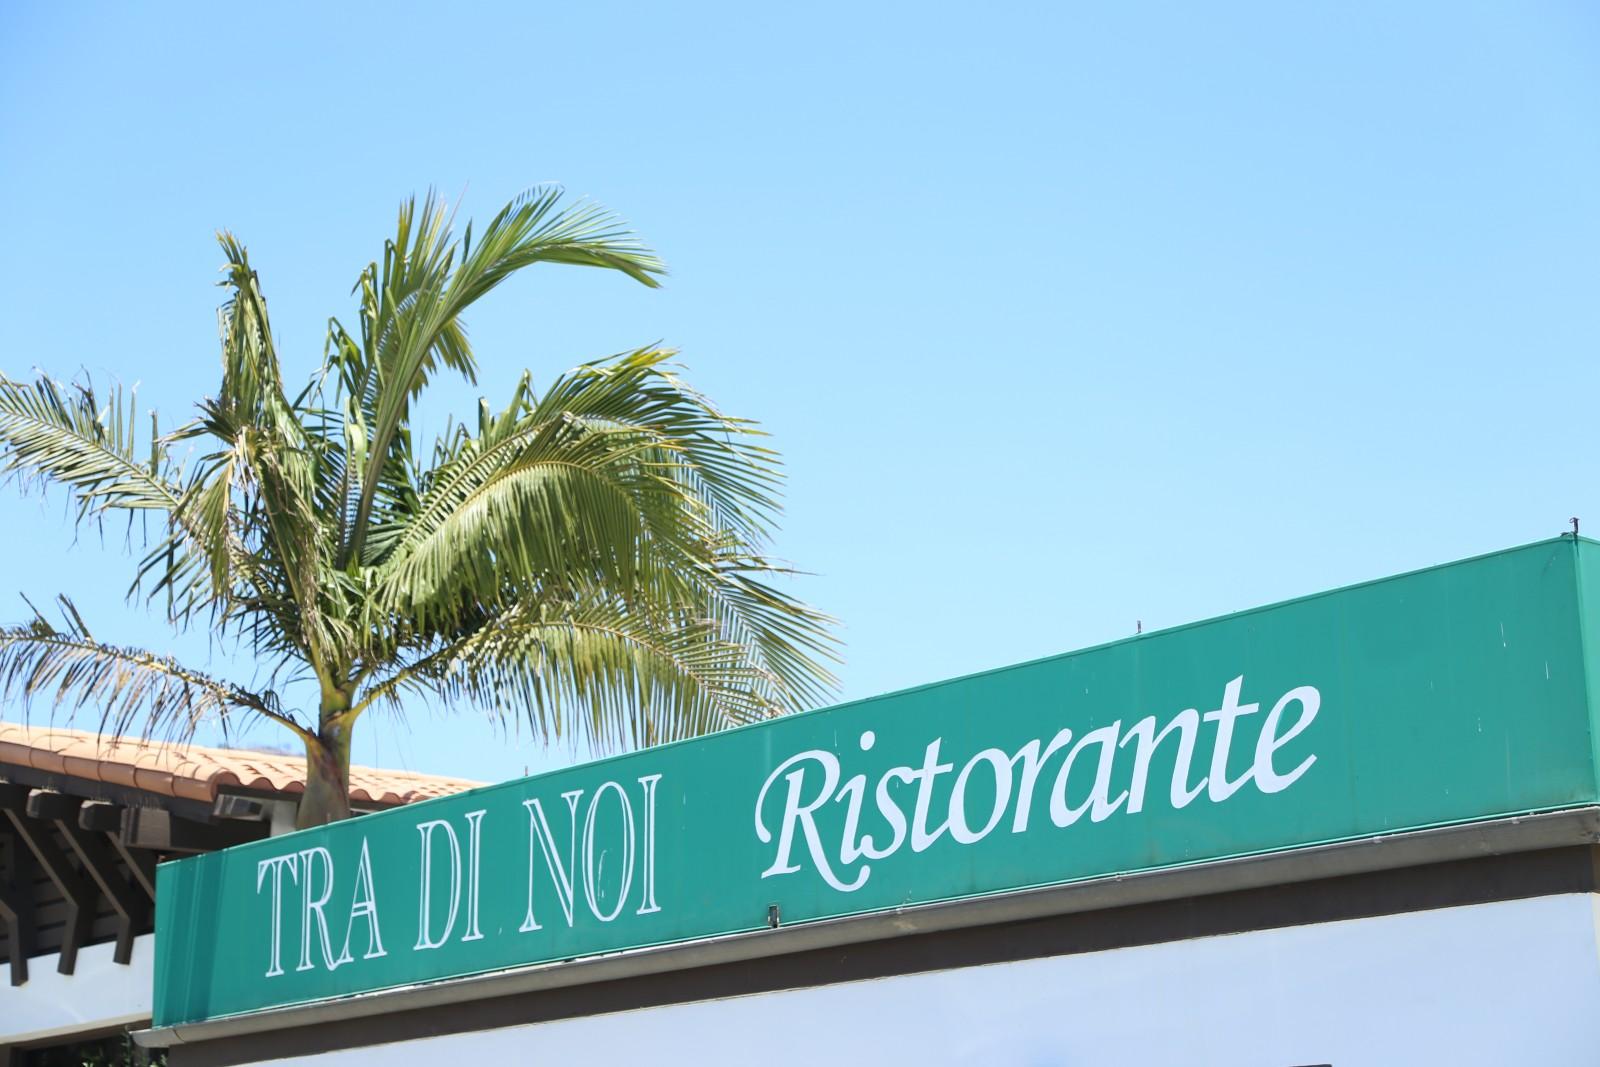 tra-di-noi-malibu-restaurant_all-things-malibu